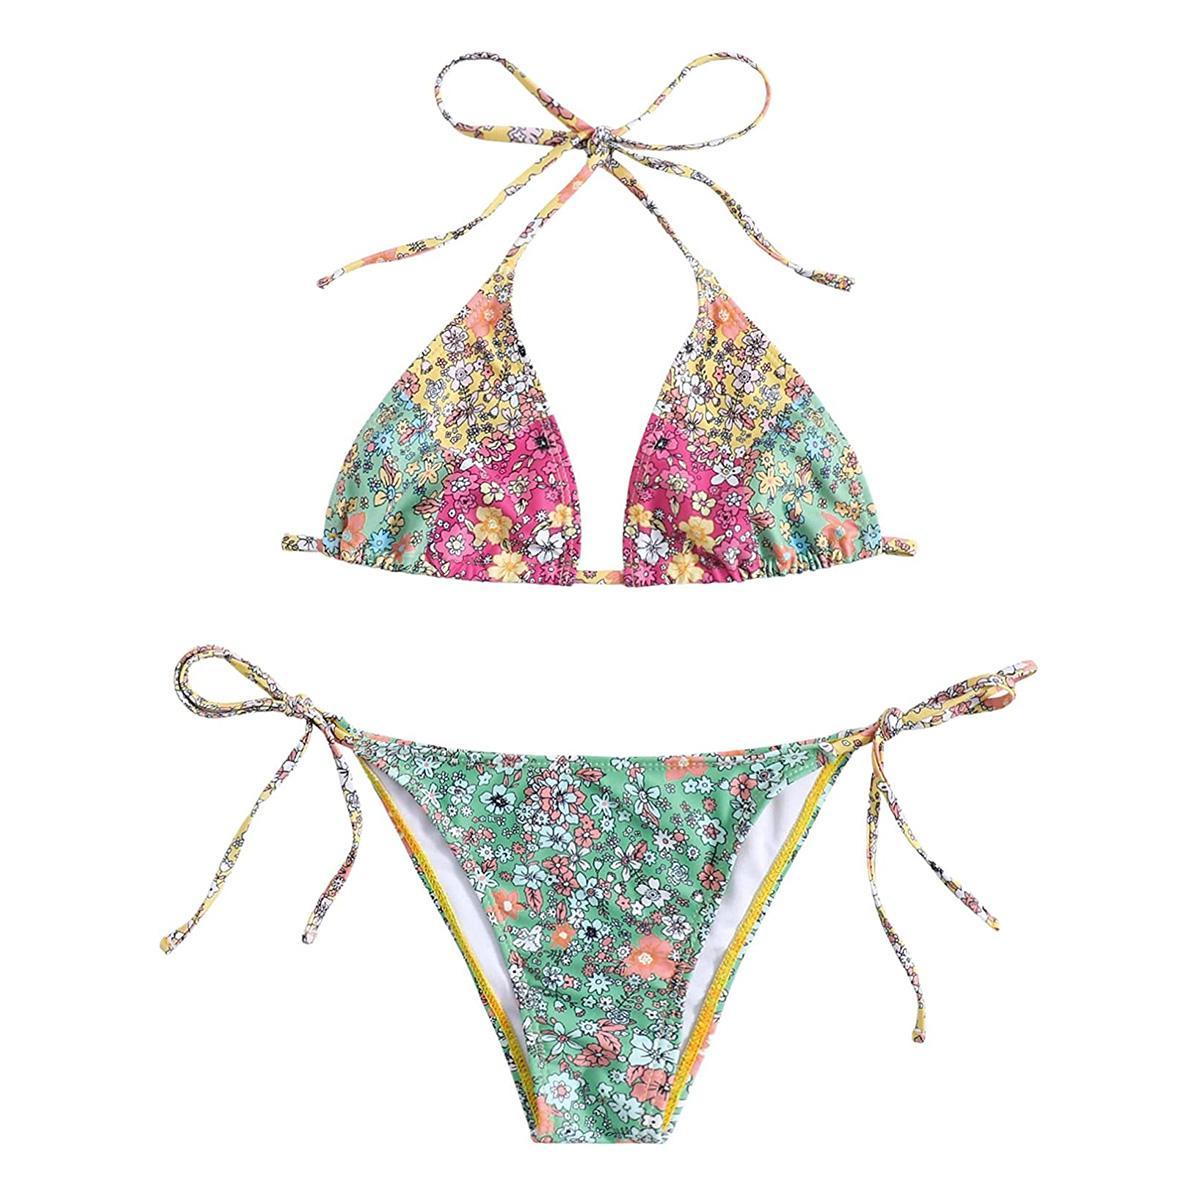 The Timeless Bikini Trend That's Classically Sexy - string bikini trend 294159 1625867100334